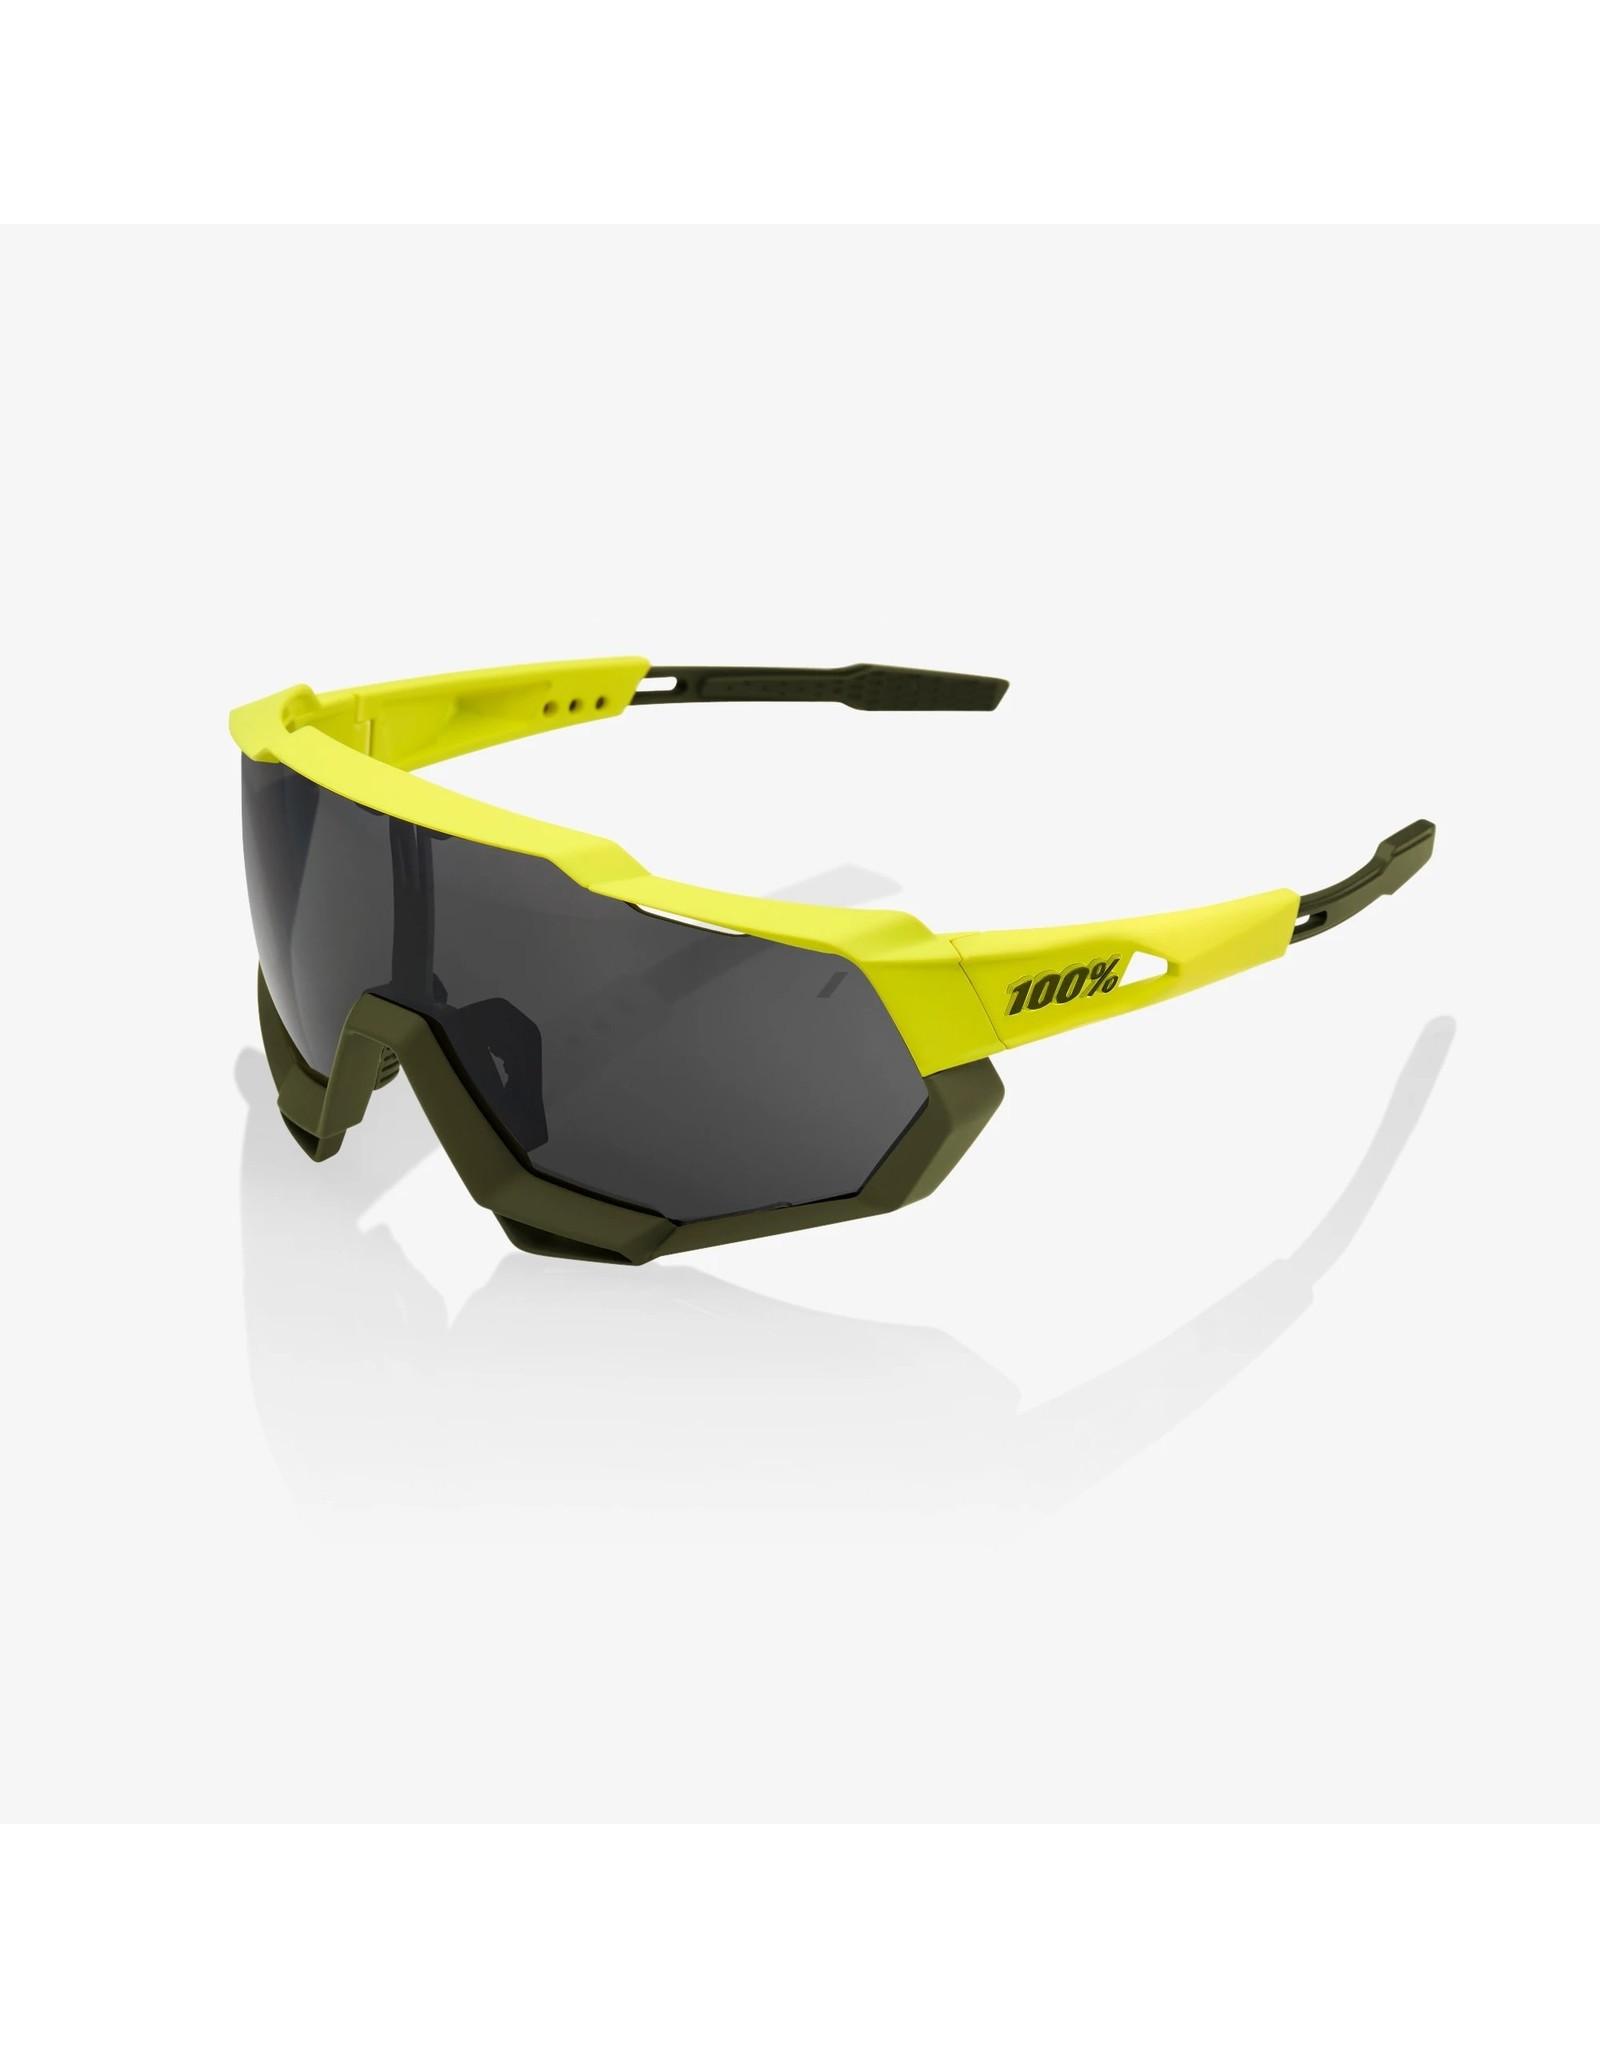 100% 100%, Speedtrap, Soft Tact Banana/Black Mirror Lens